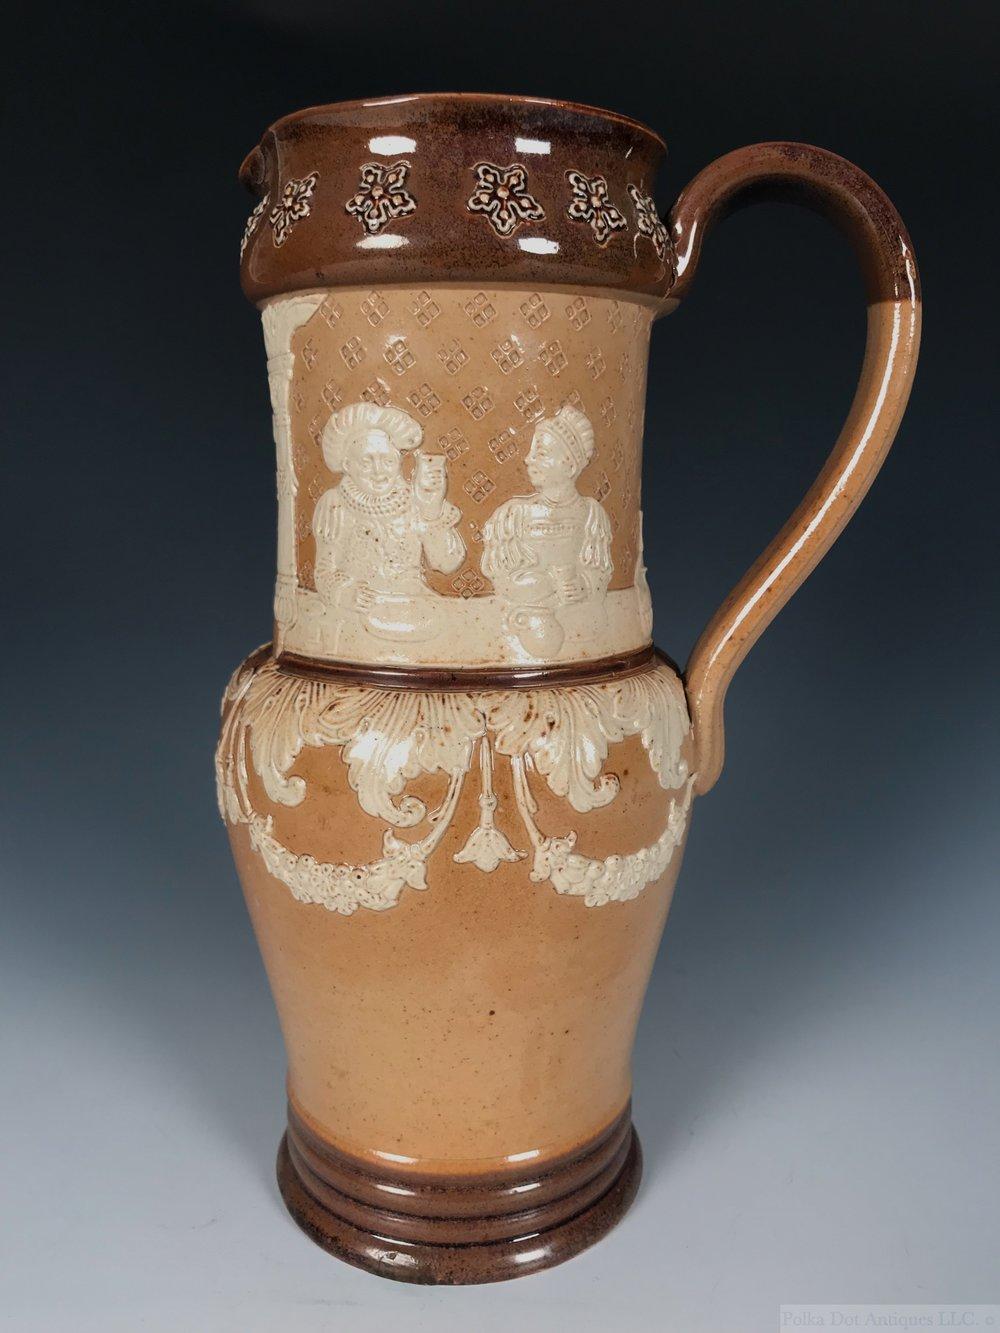 "Doulton Lambeth Salt Glazed Stoneware Jug, 1891-1902, 9¼"" high."